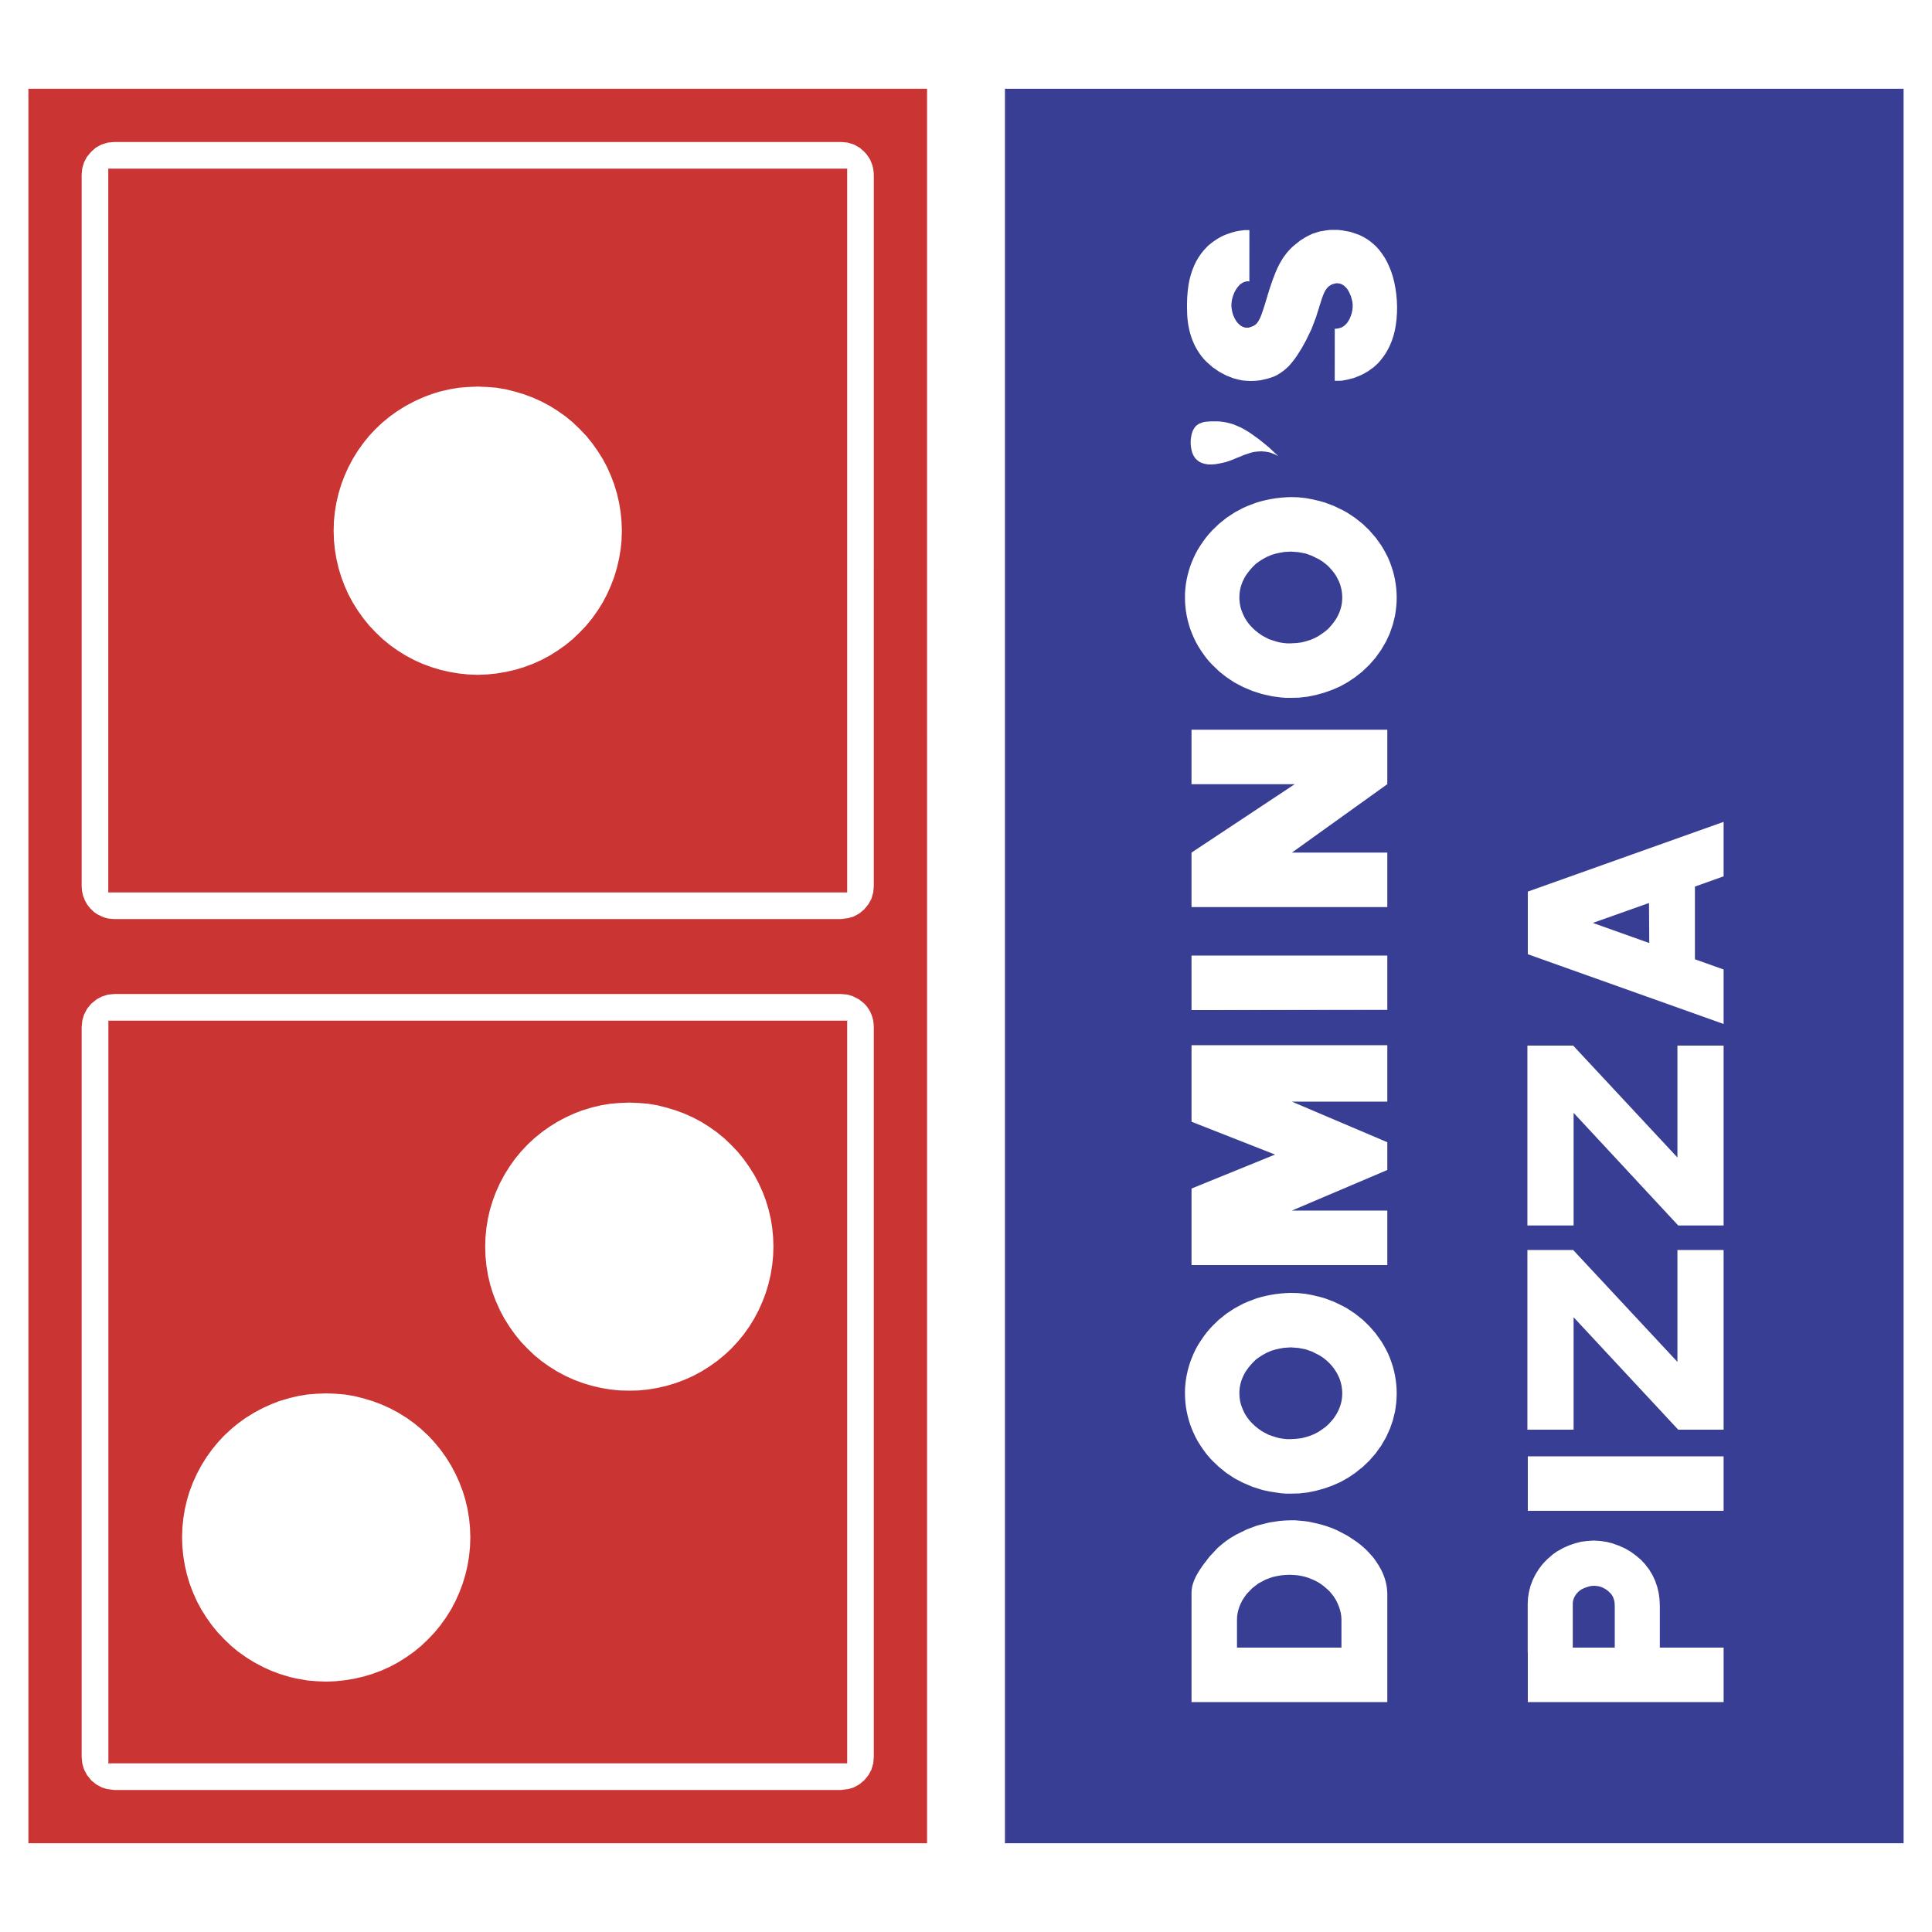 domino�s pizza � logos download